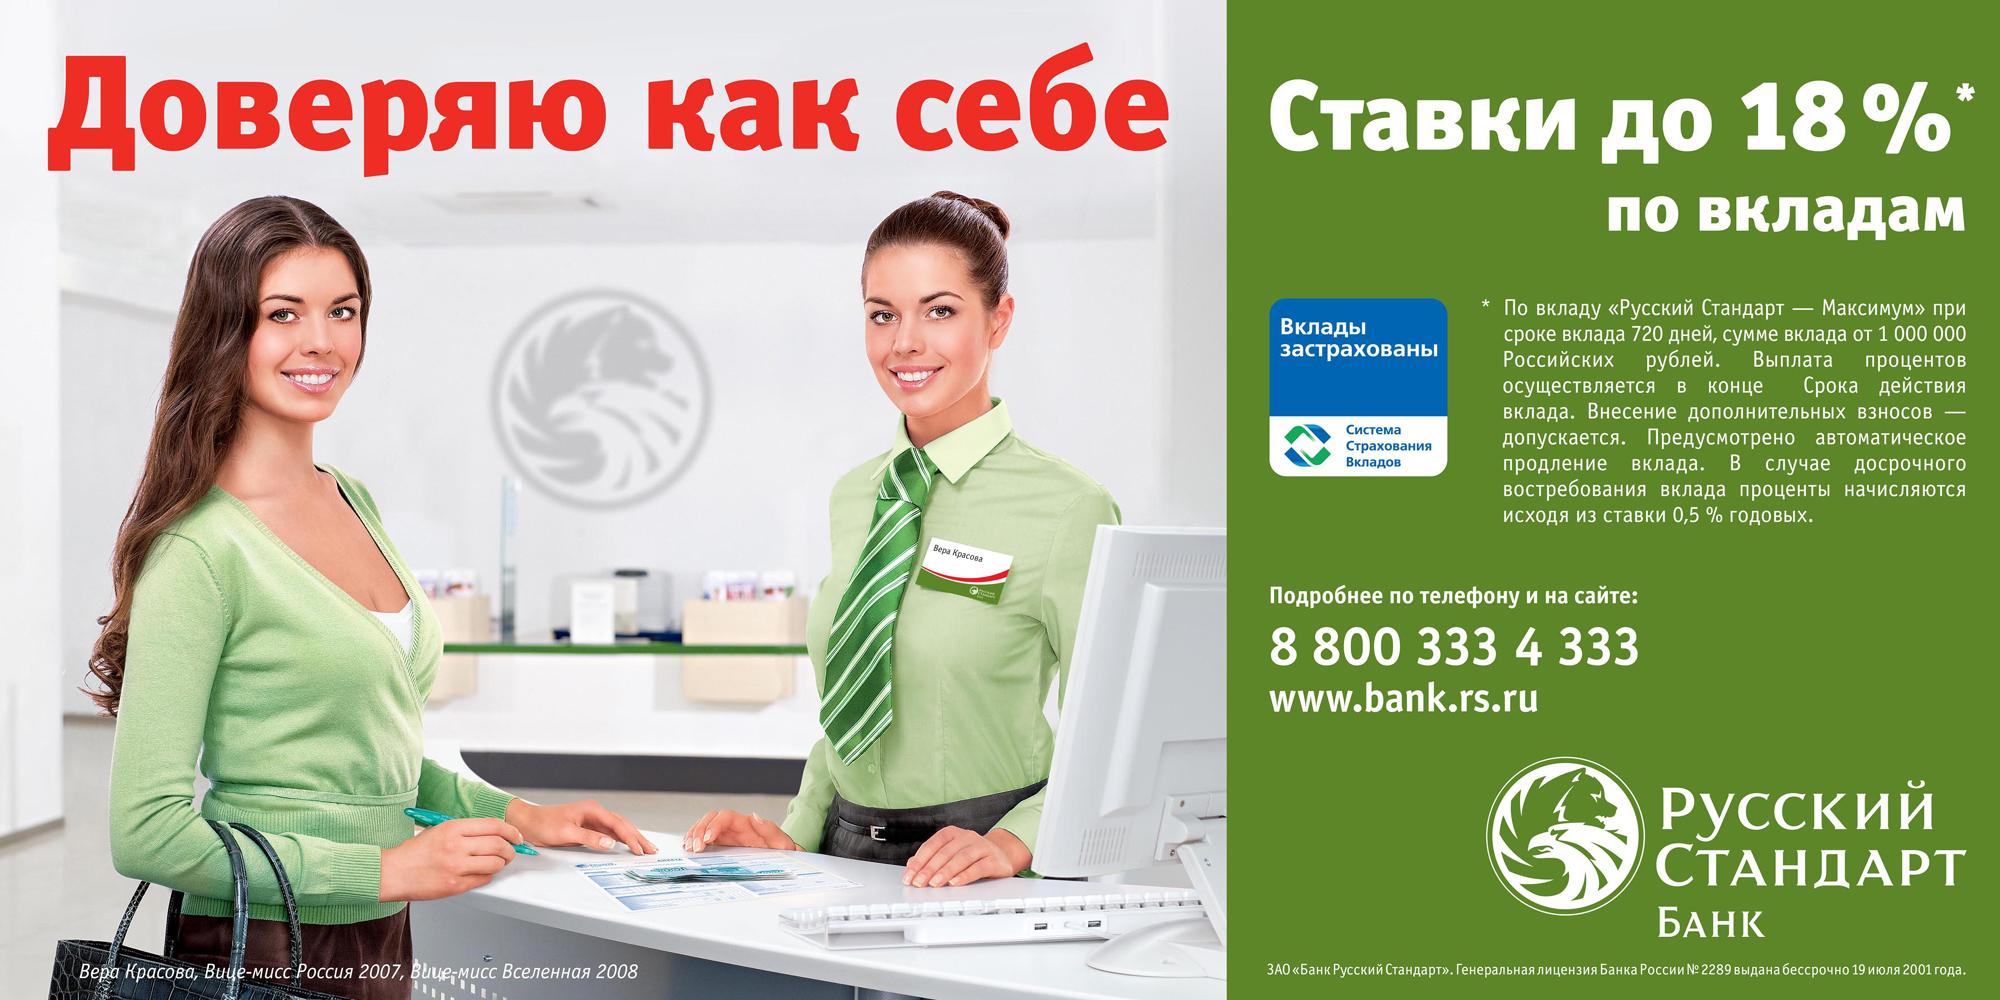 Банка русский стандарт с